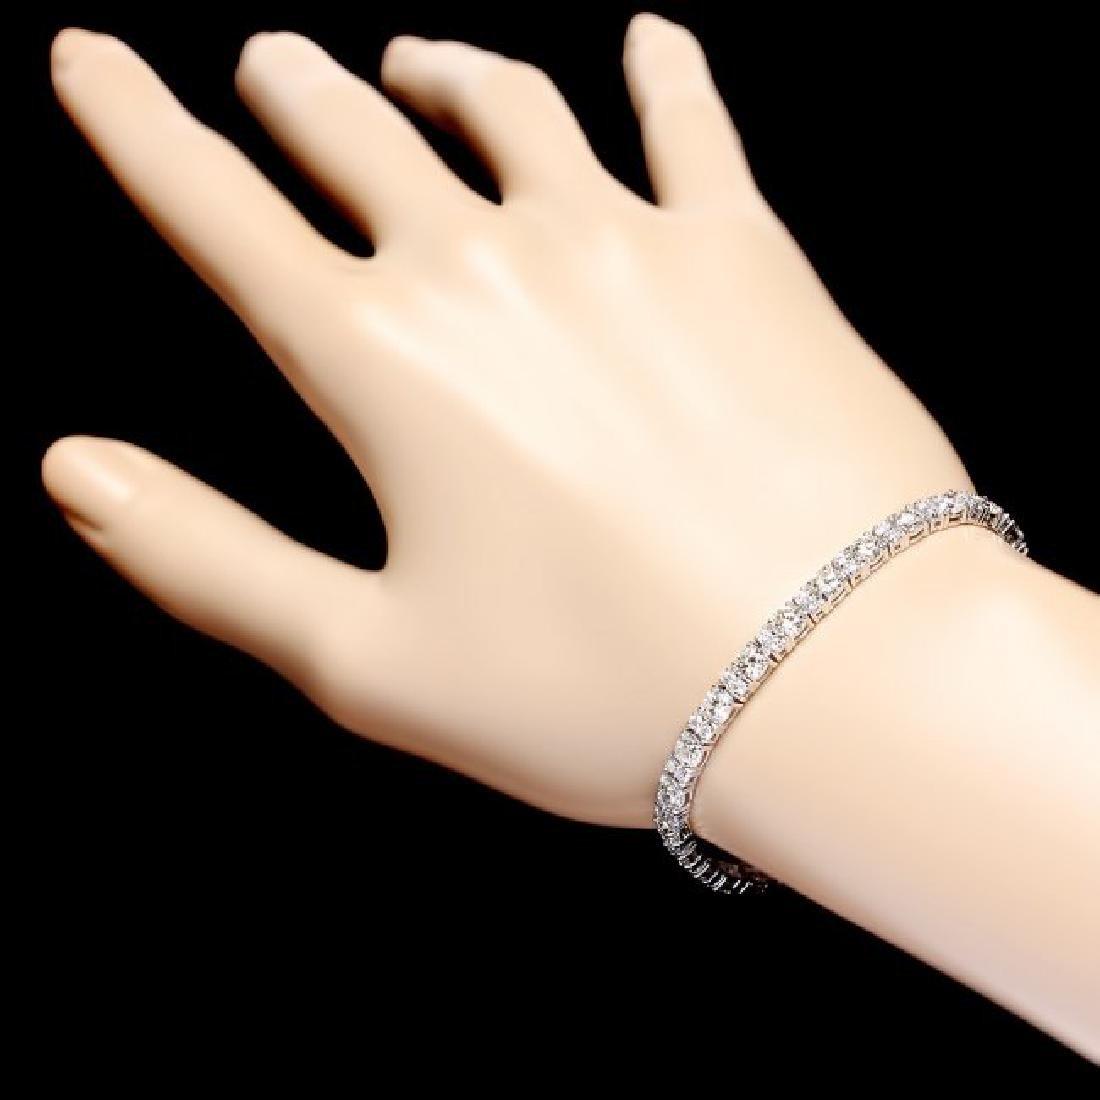 18k White Gold 8.60ct Diamond Bracelet - 5